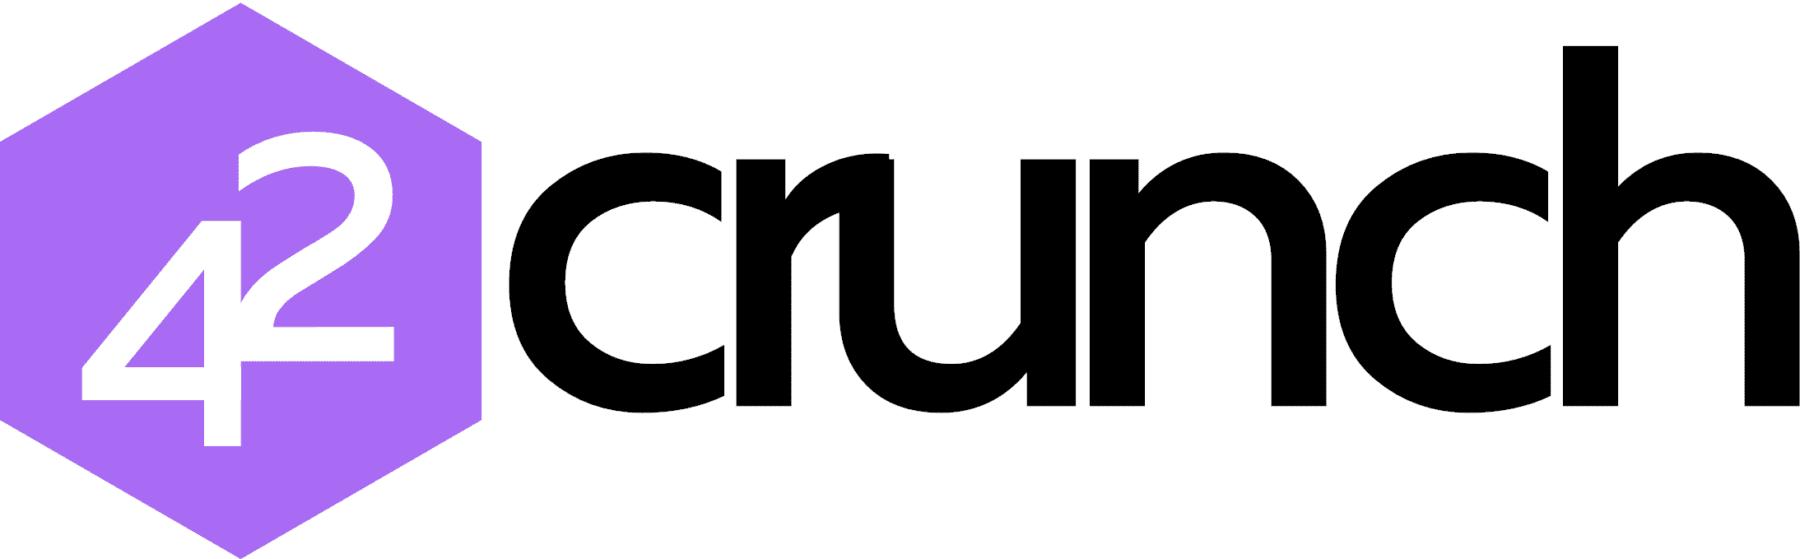 42 Crunch